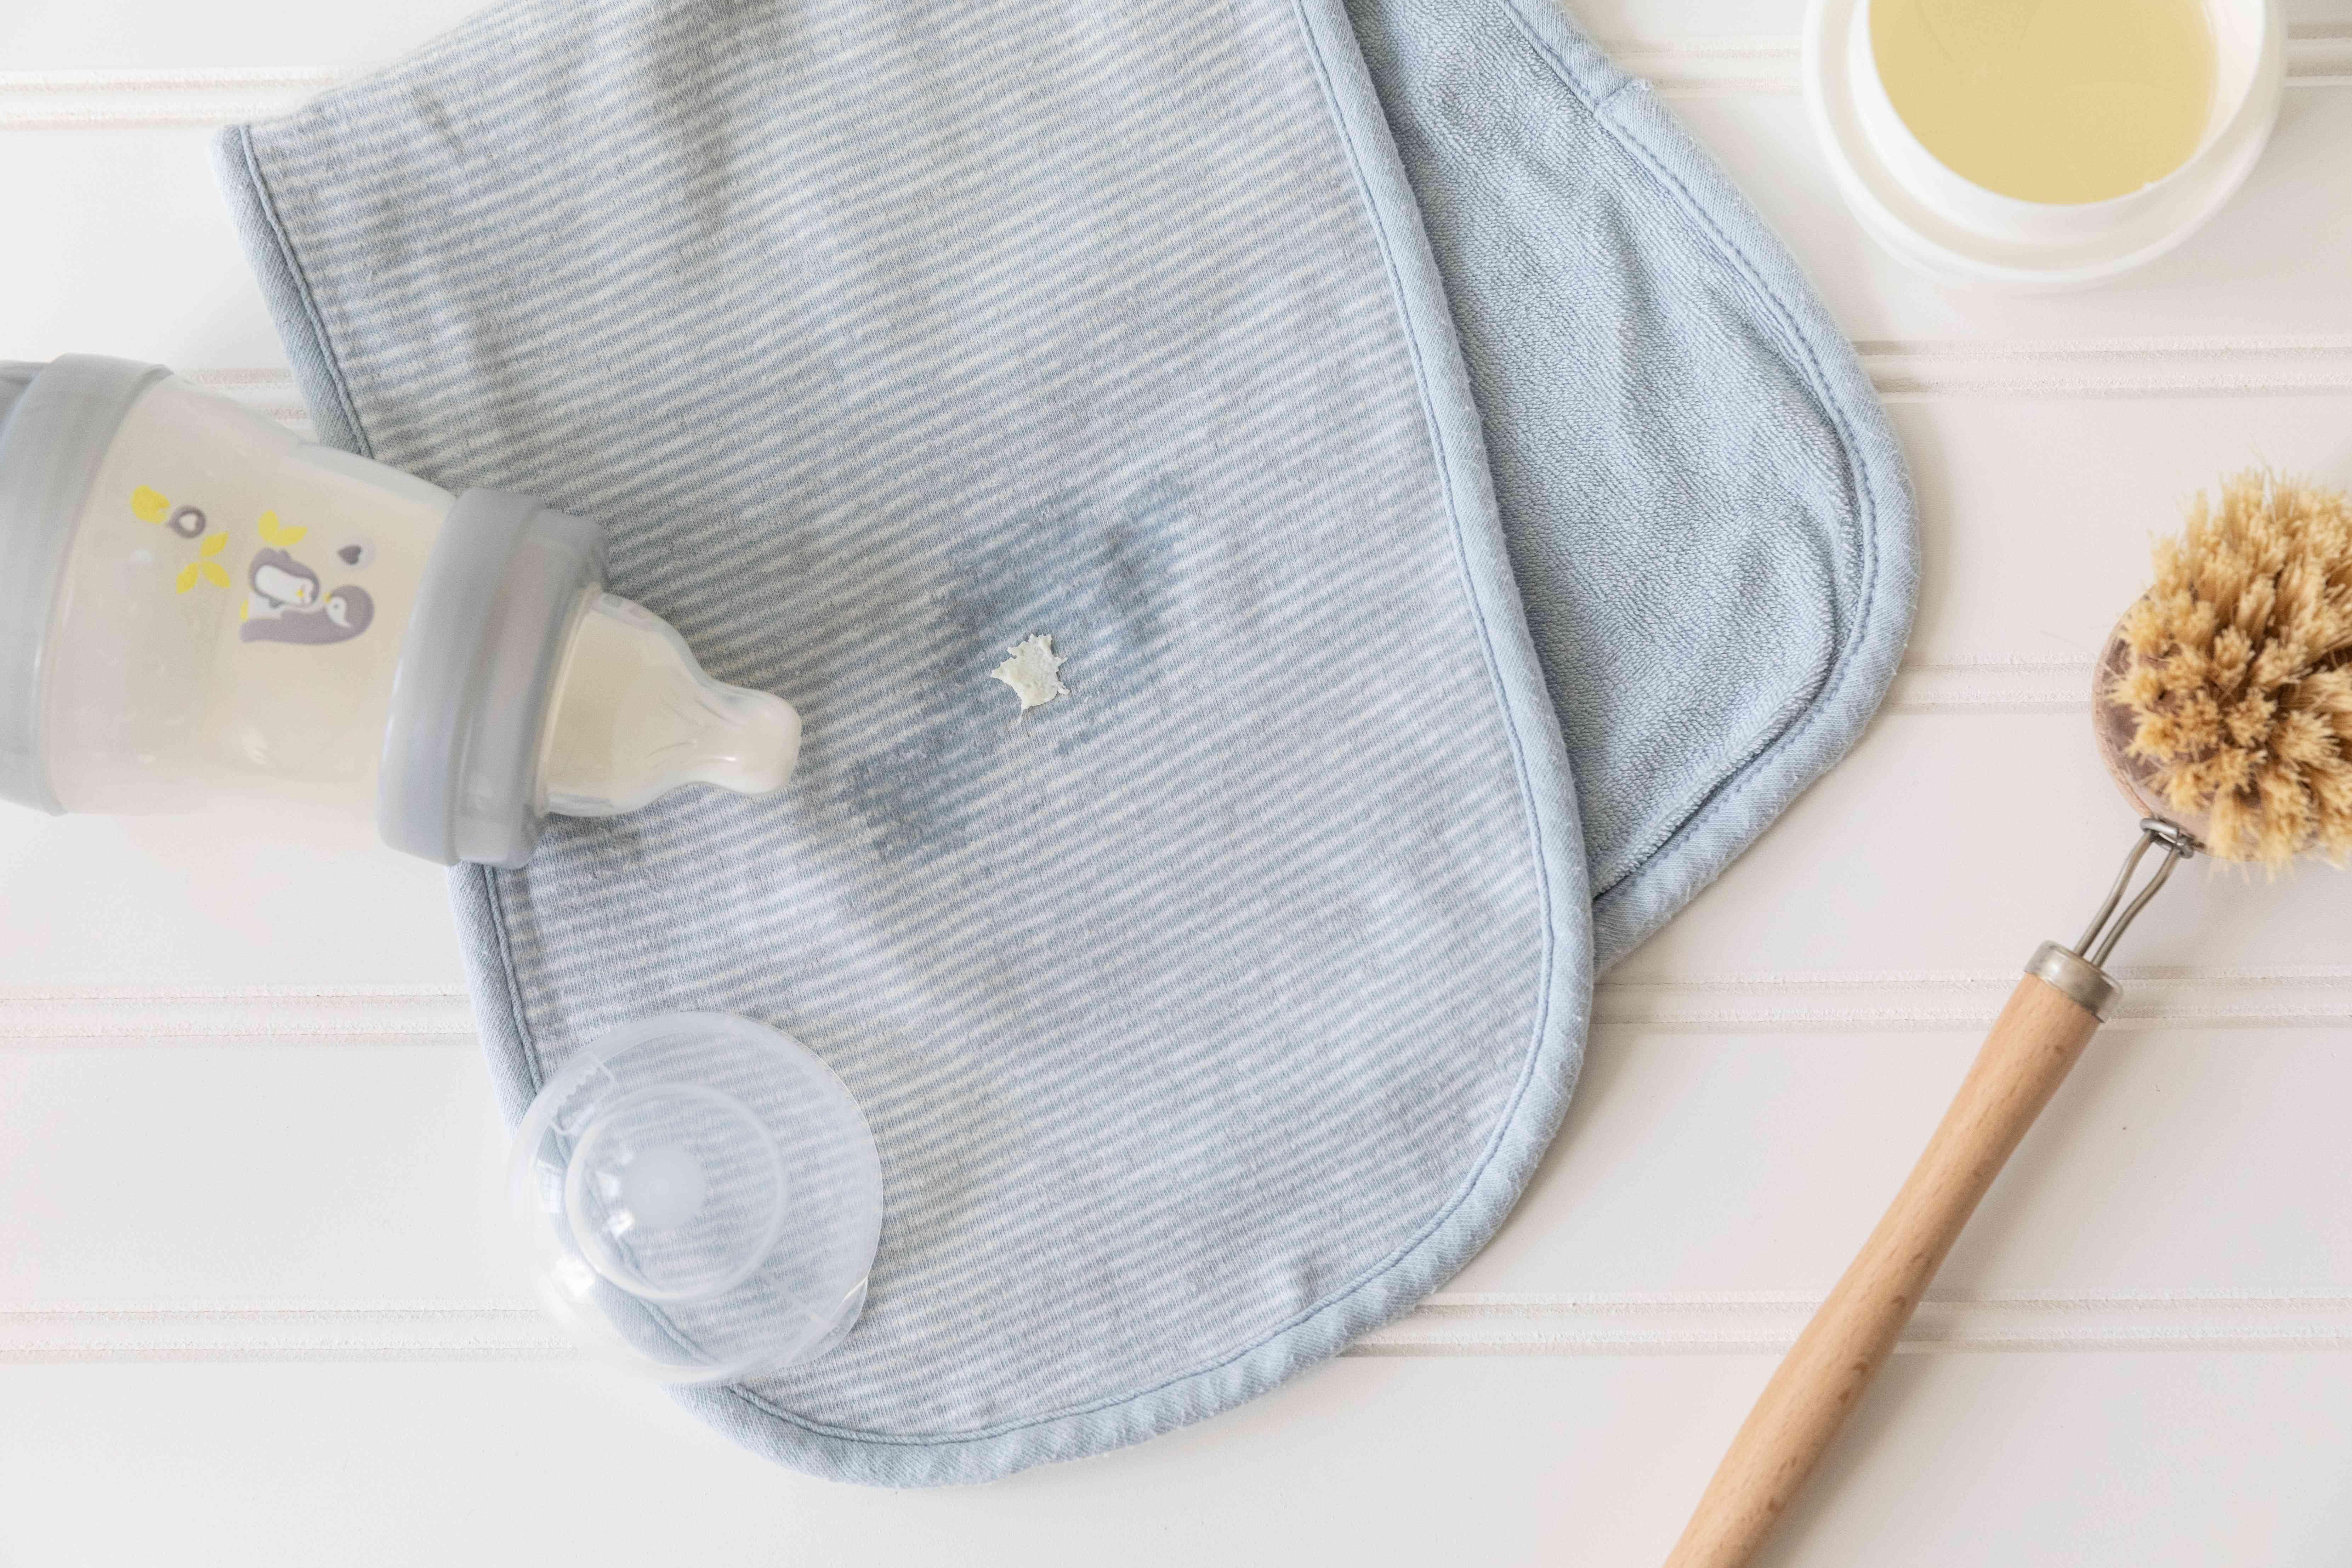 Baby bottle with protein formula spilled on blue bib next to soft-bristled brush